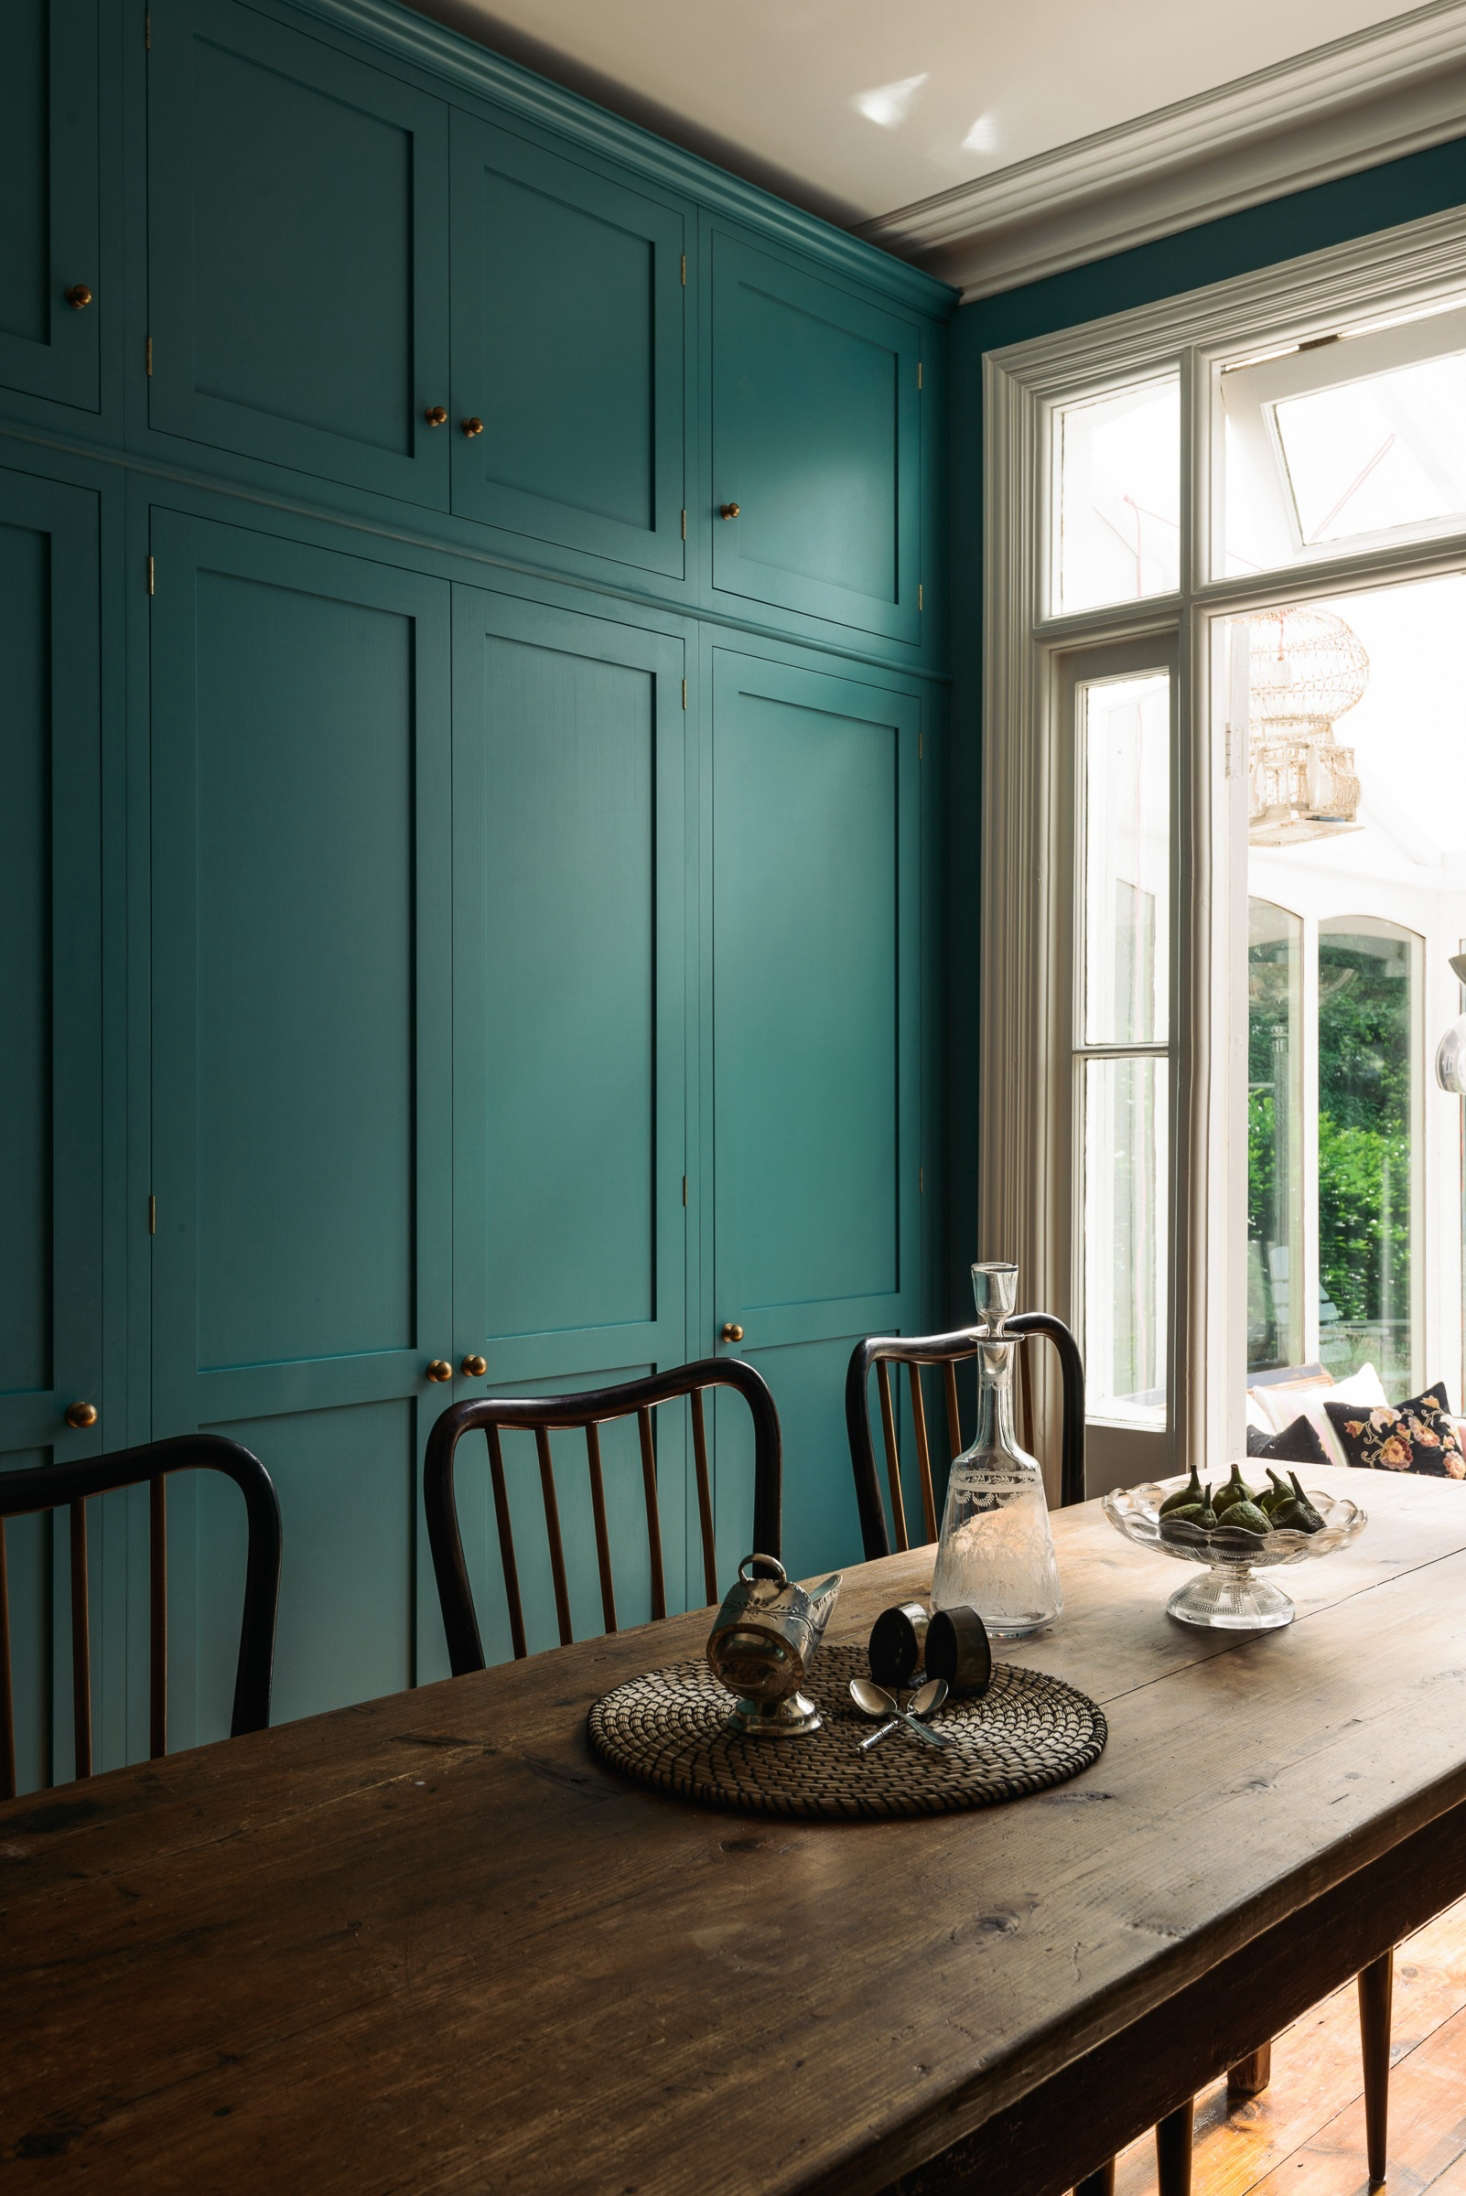 Shaker-style deVol kitchen in London with statement tiled backsplash